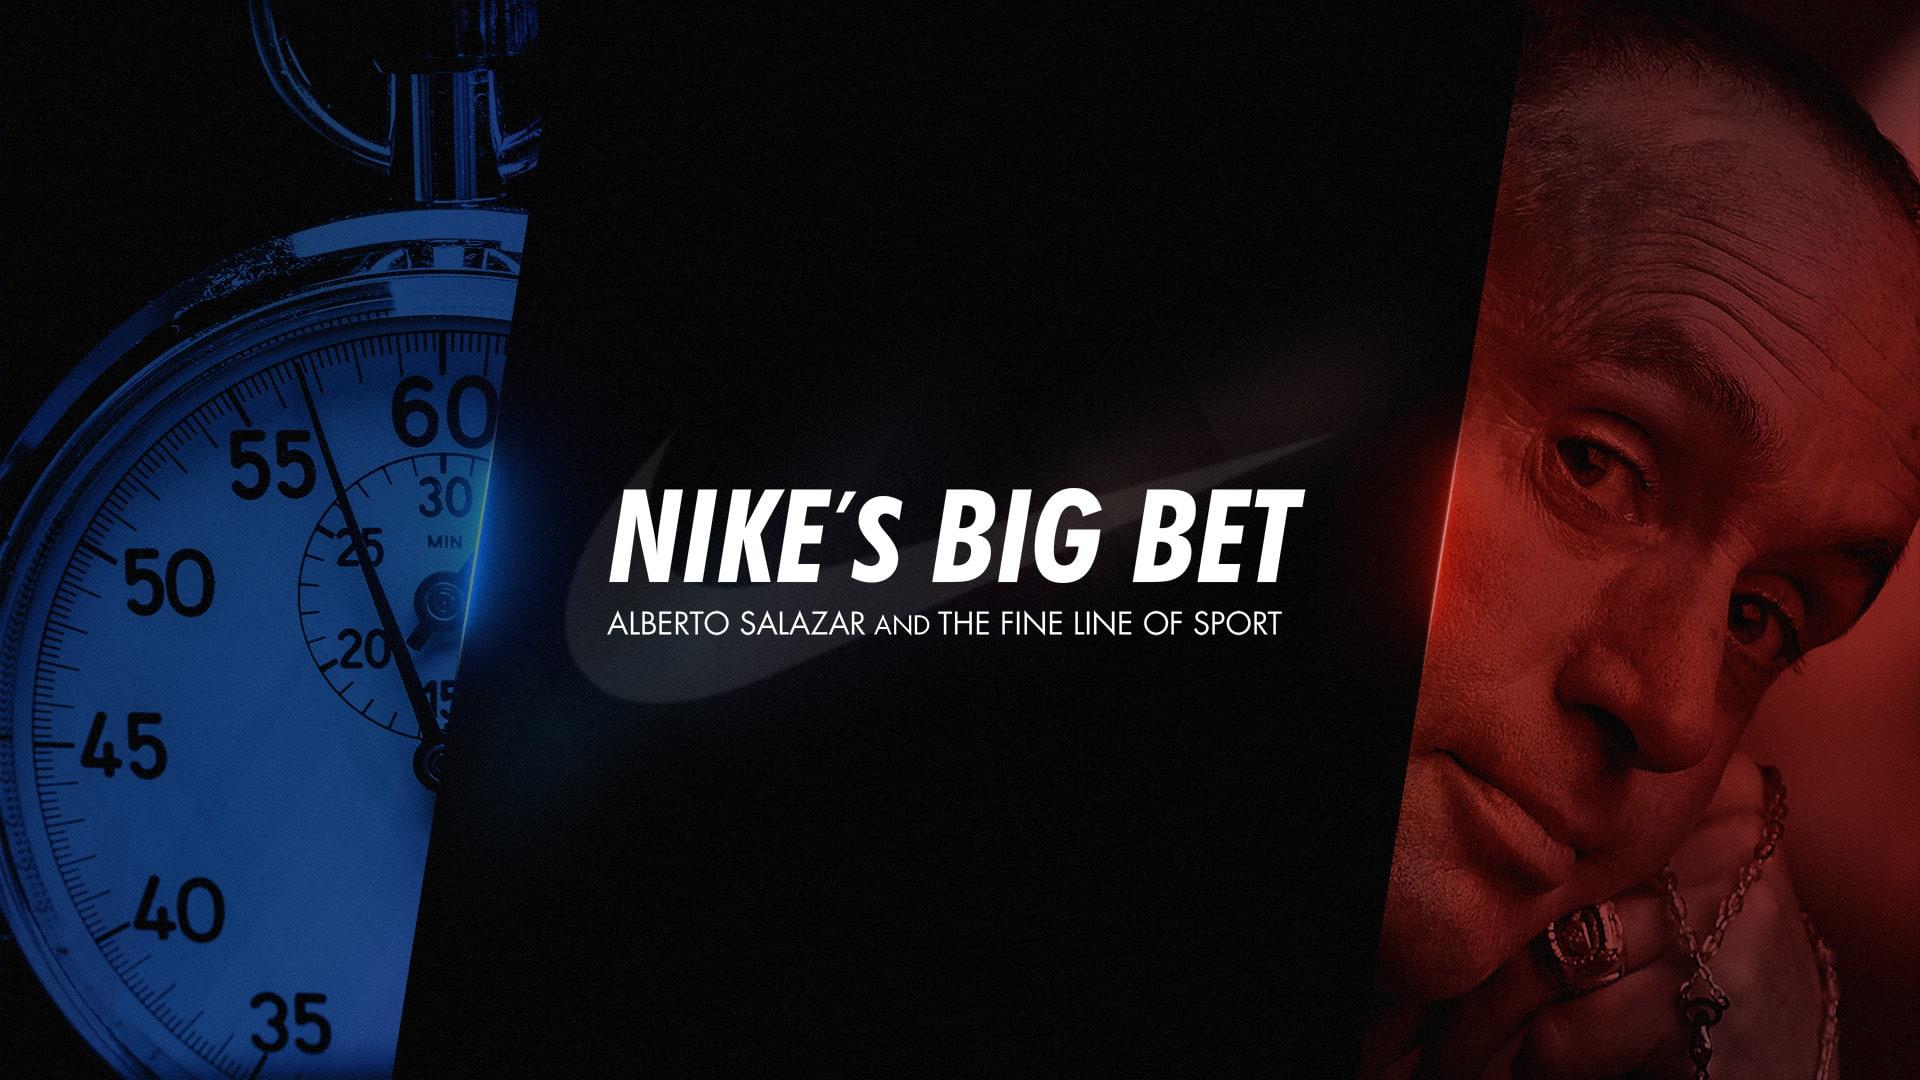 Nike's Big Bet: Alberto Salazar and the Fine Line of Sport